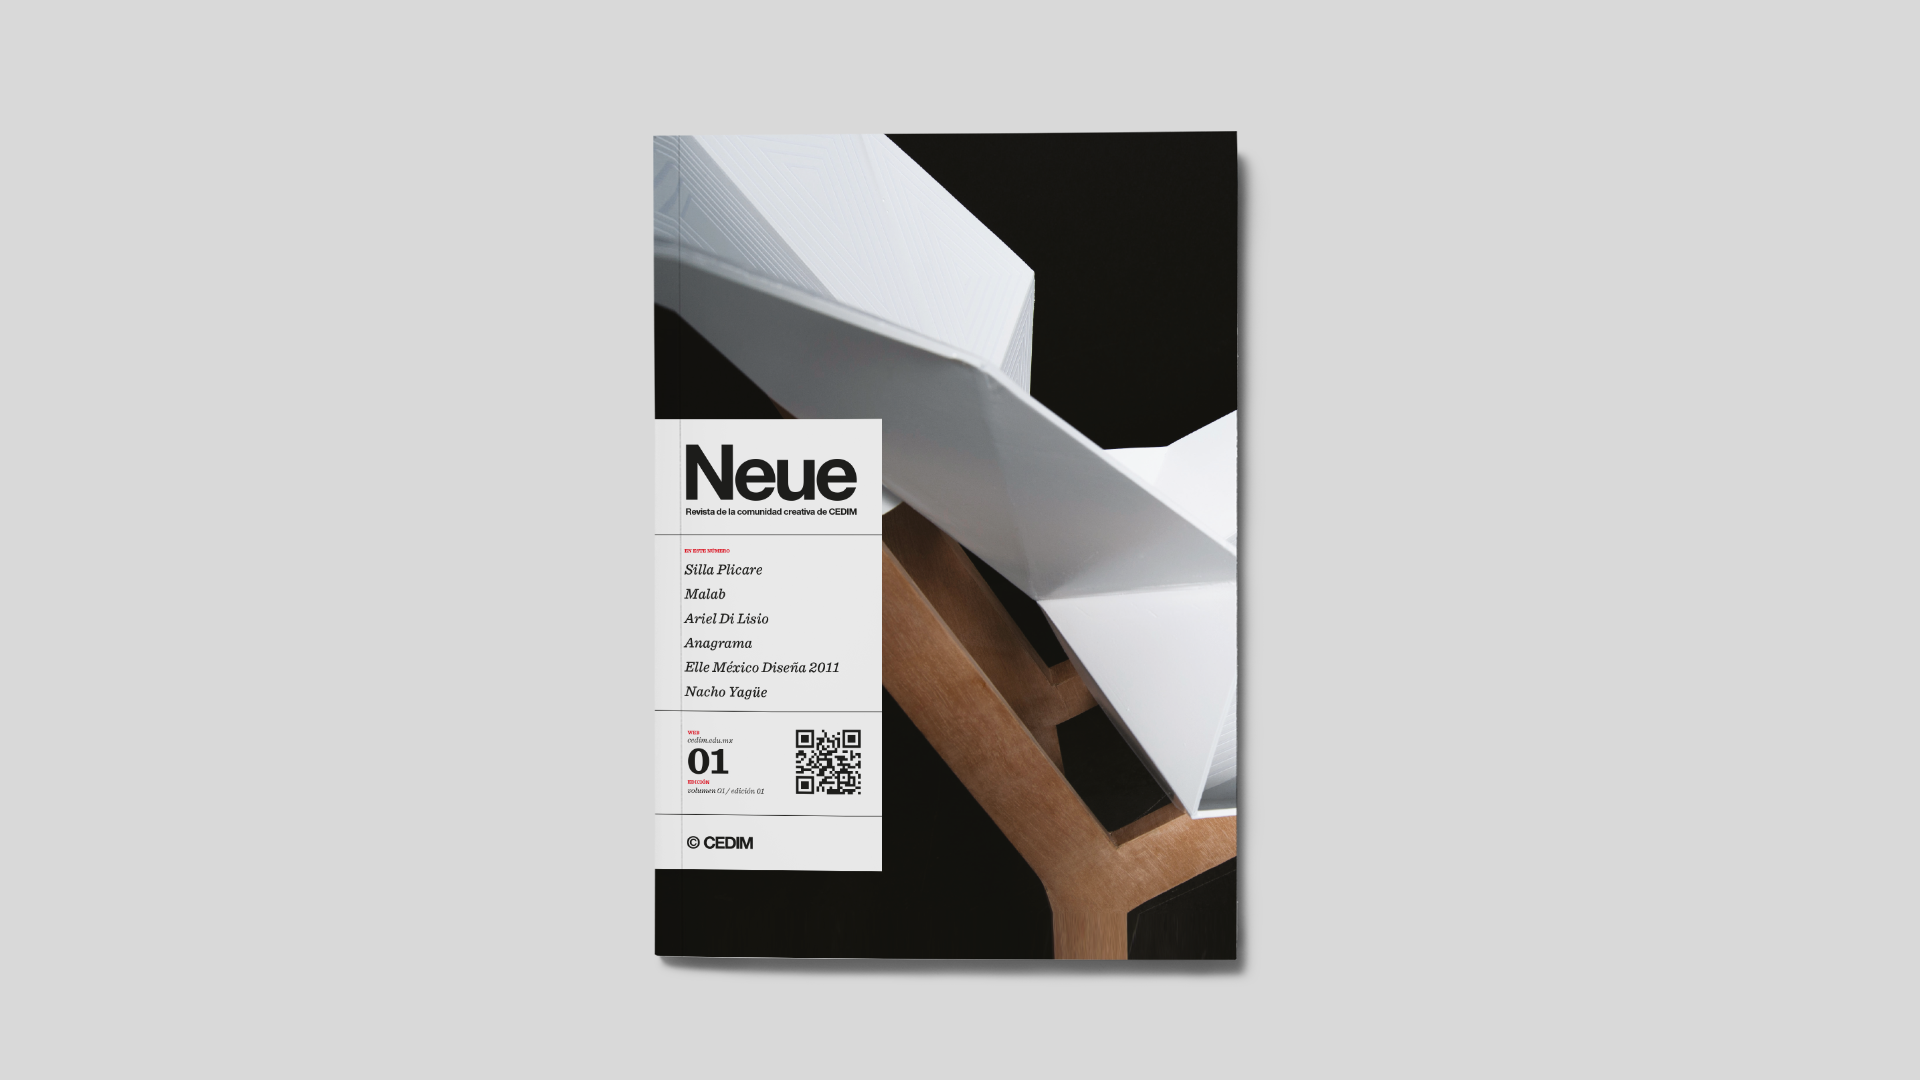 cover-neue-magazine-cedim-yoenpaperland